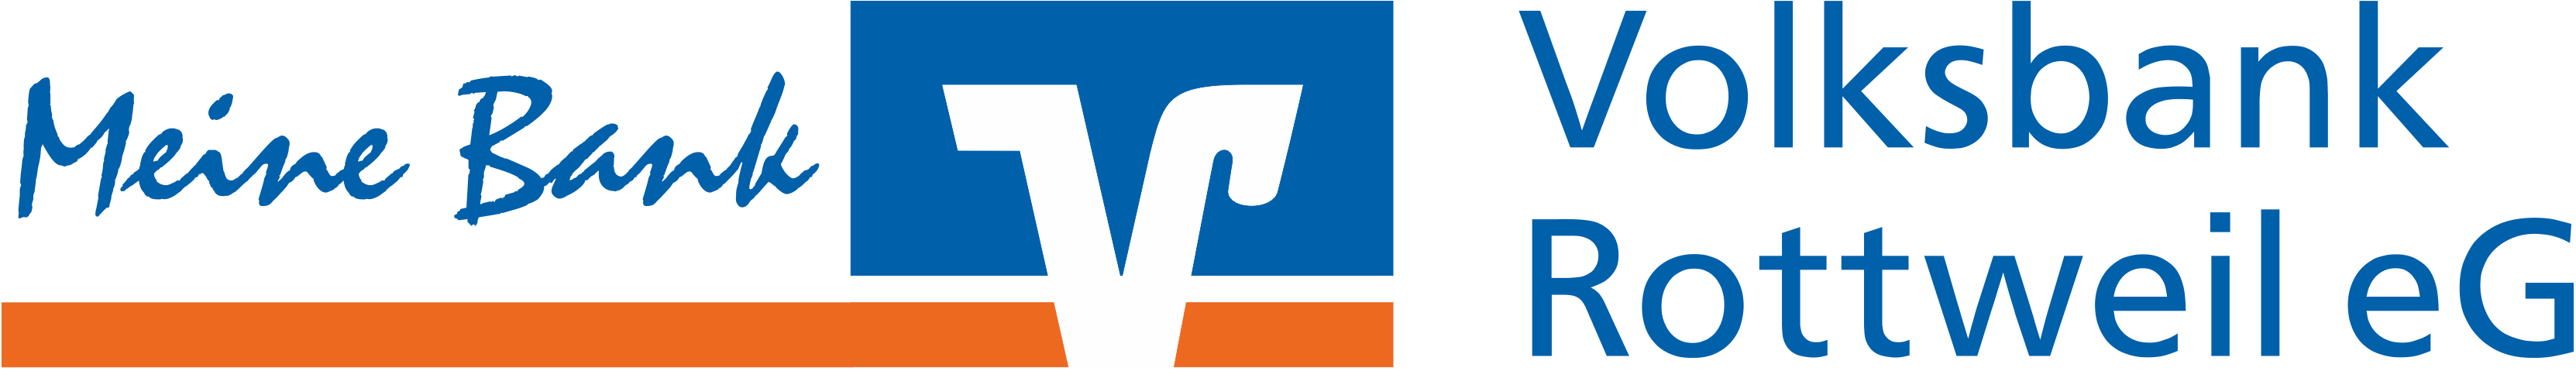 Volksbank Rottweil Merz Immobilien Finanzierung